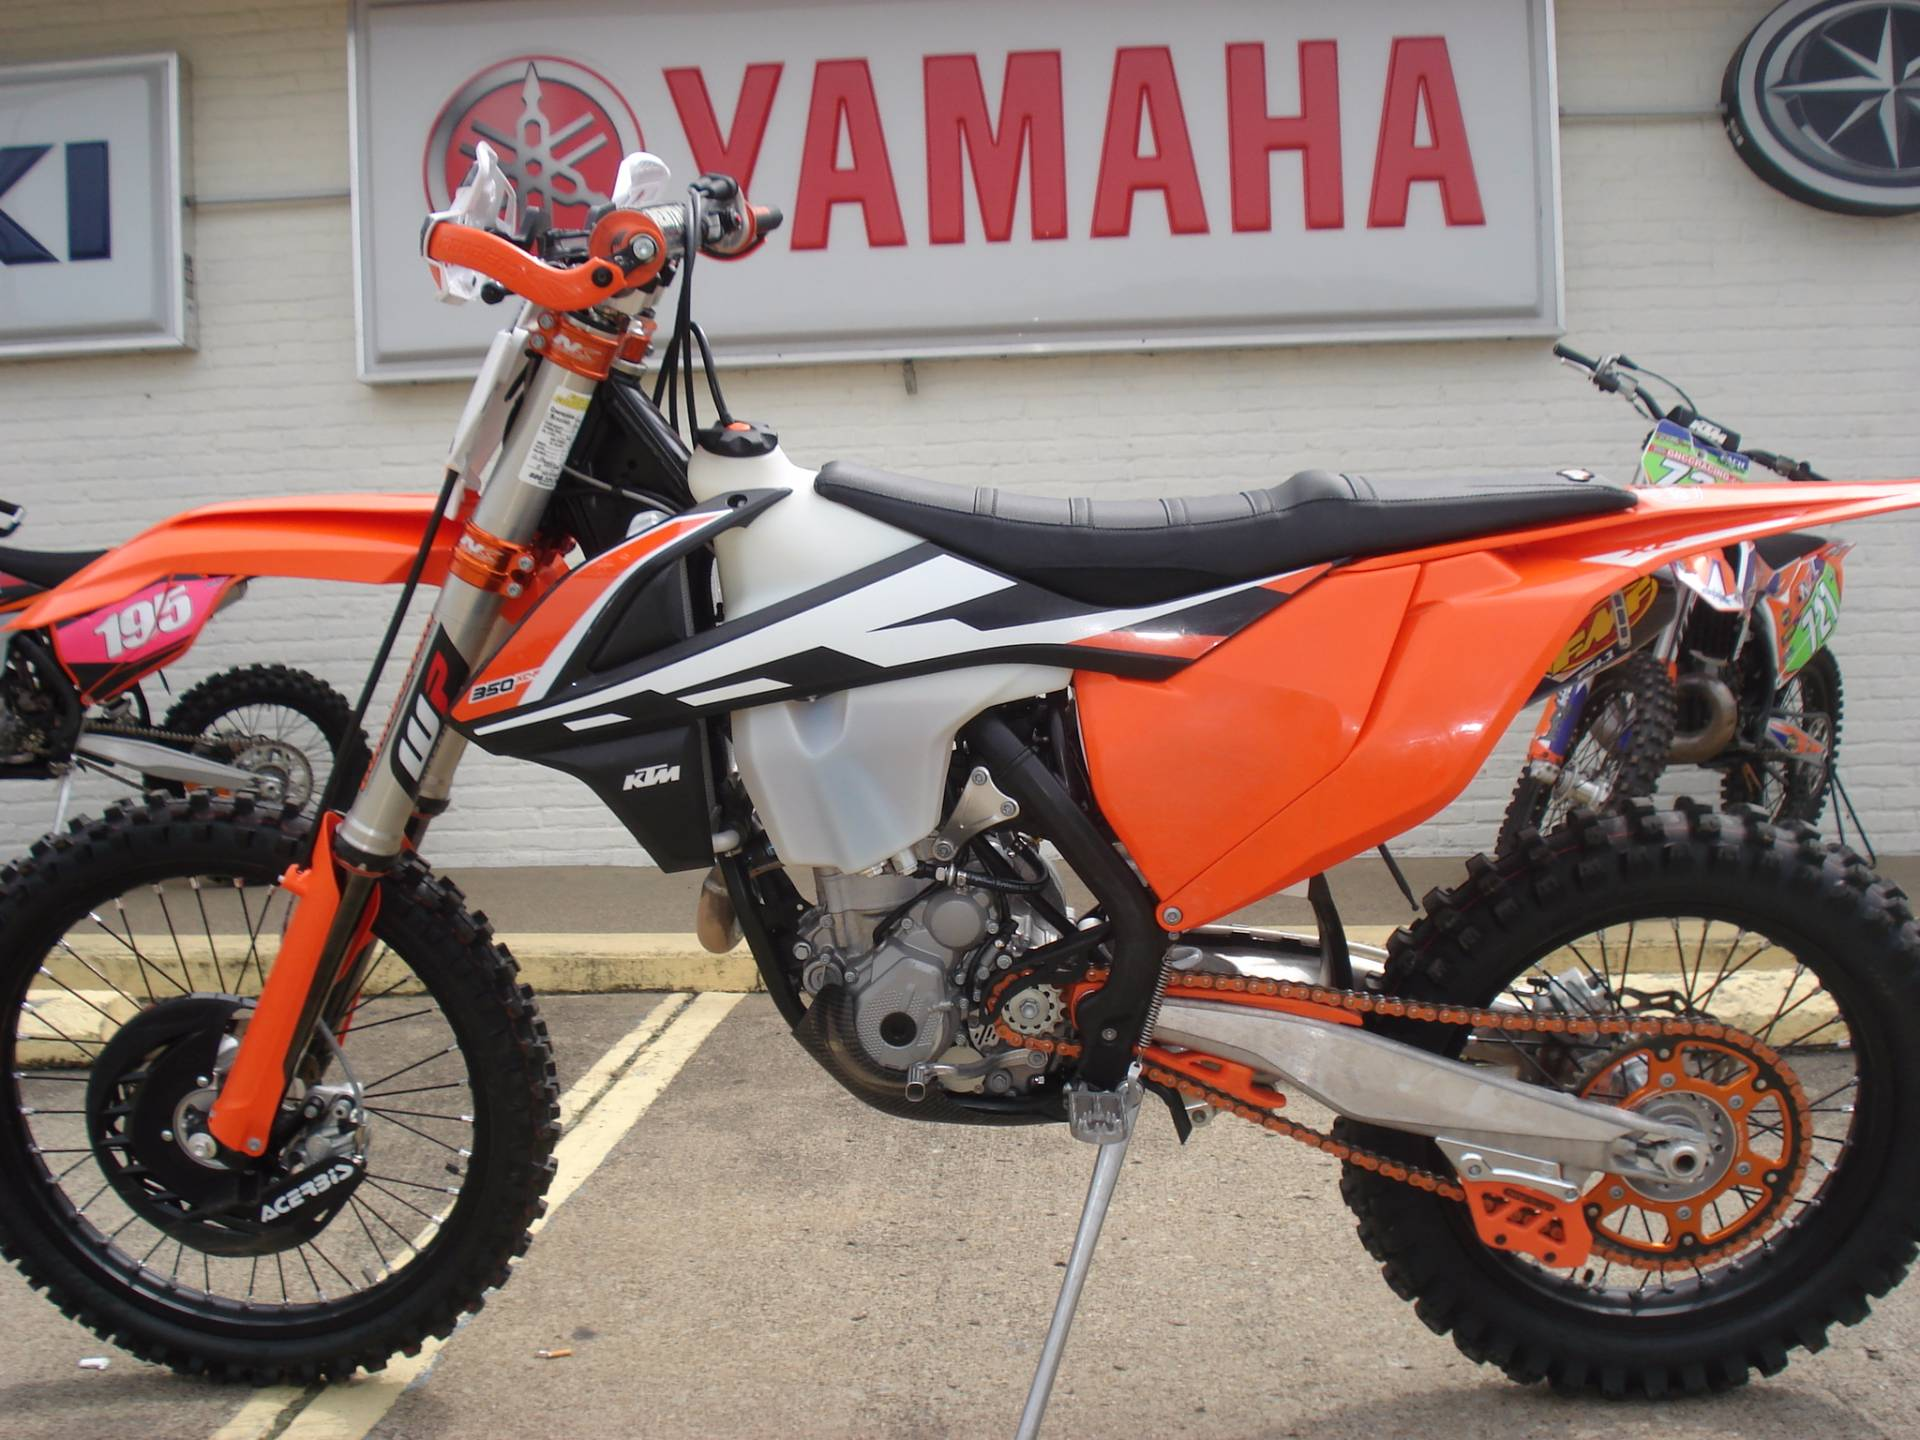 Waynesburg yamaha inventory dealer in waynesburg pa 15370 for Yamaha dealers in pa